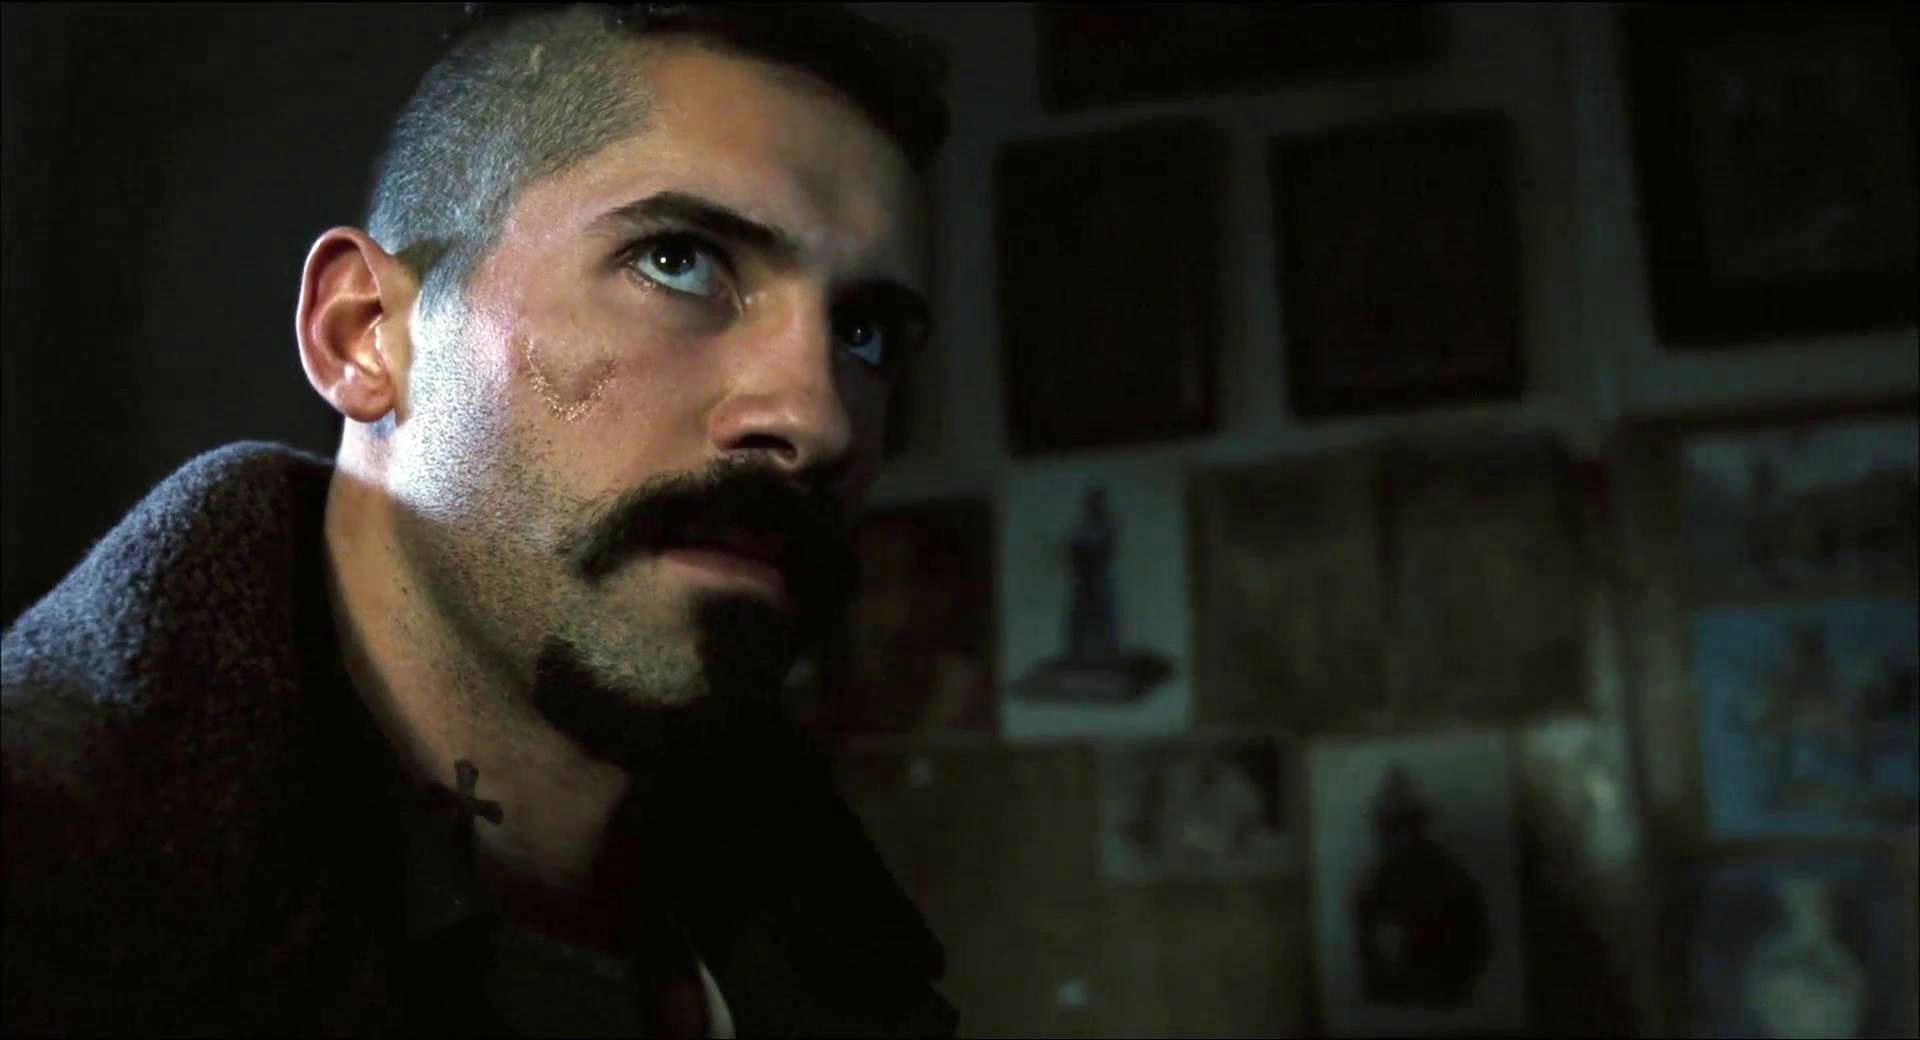 Undisputed 2: Last Man Standing (Video 2006) - Photo Gallery - IMDb